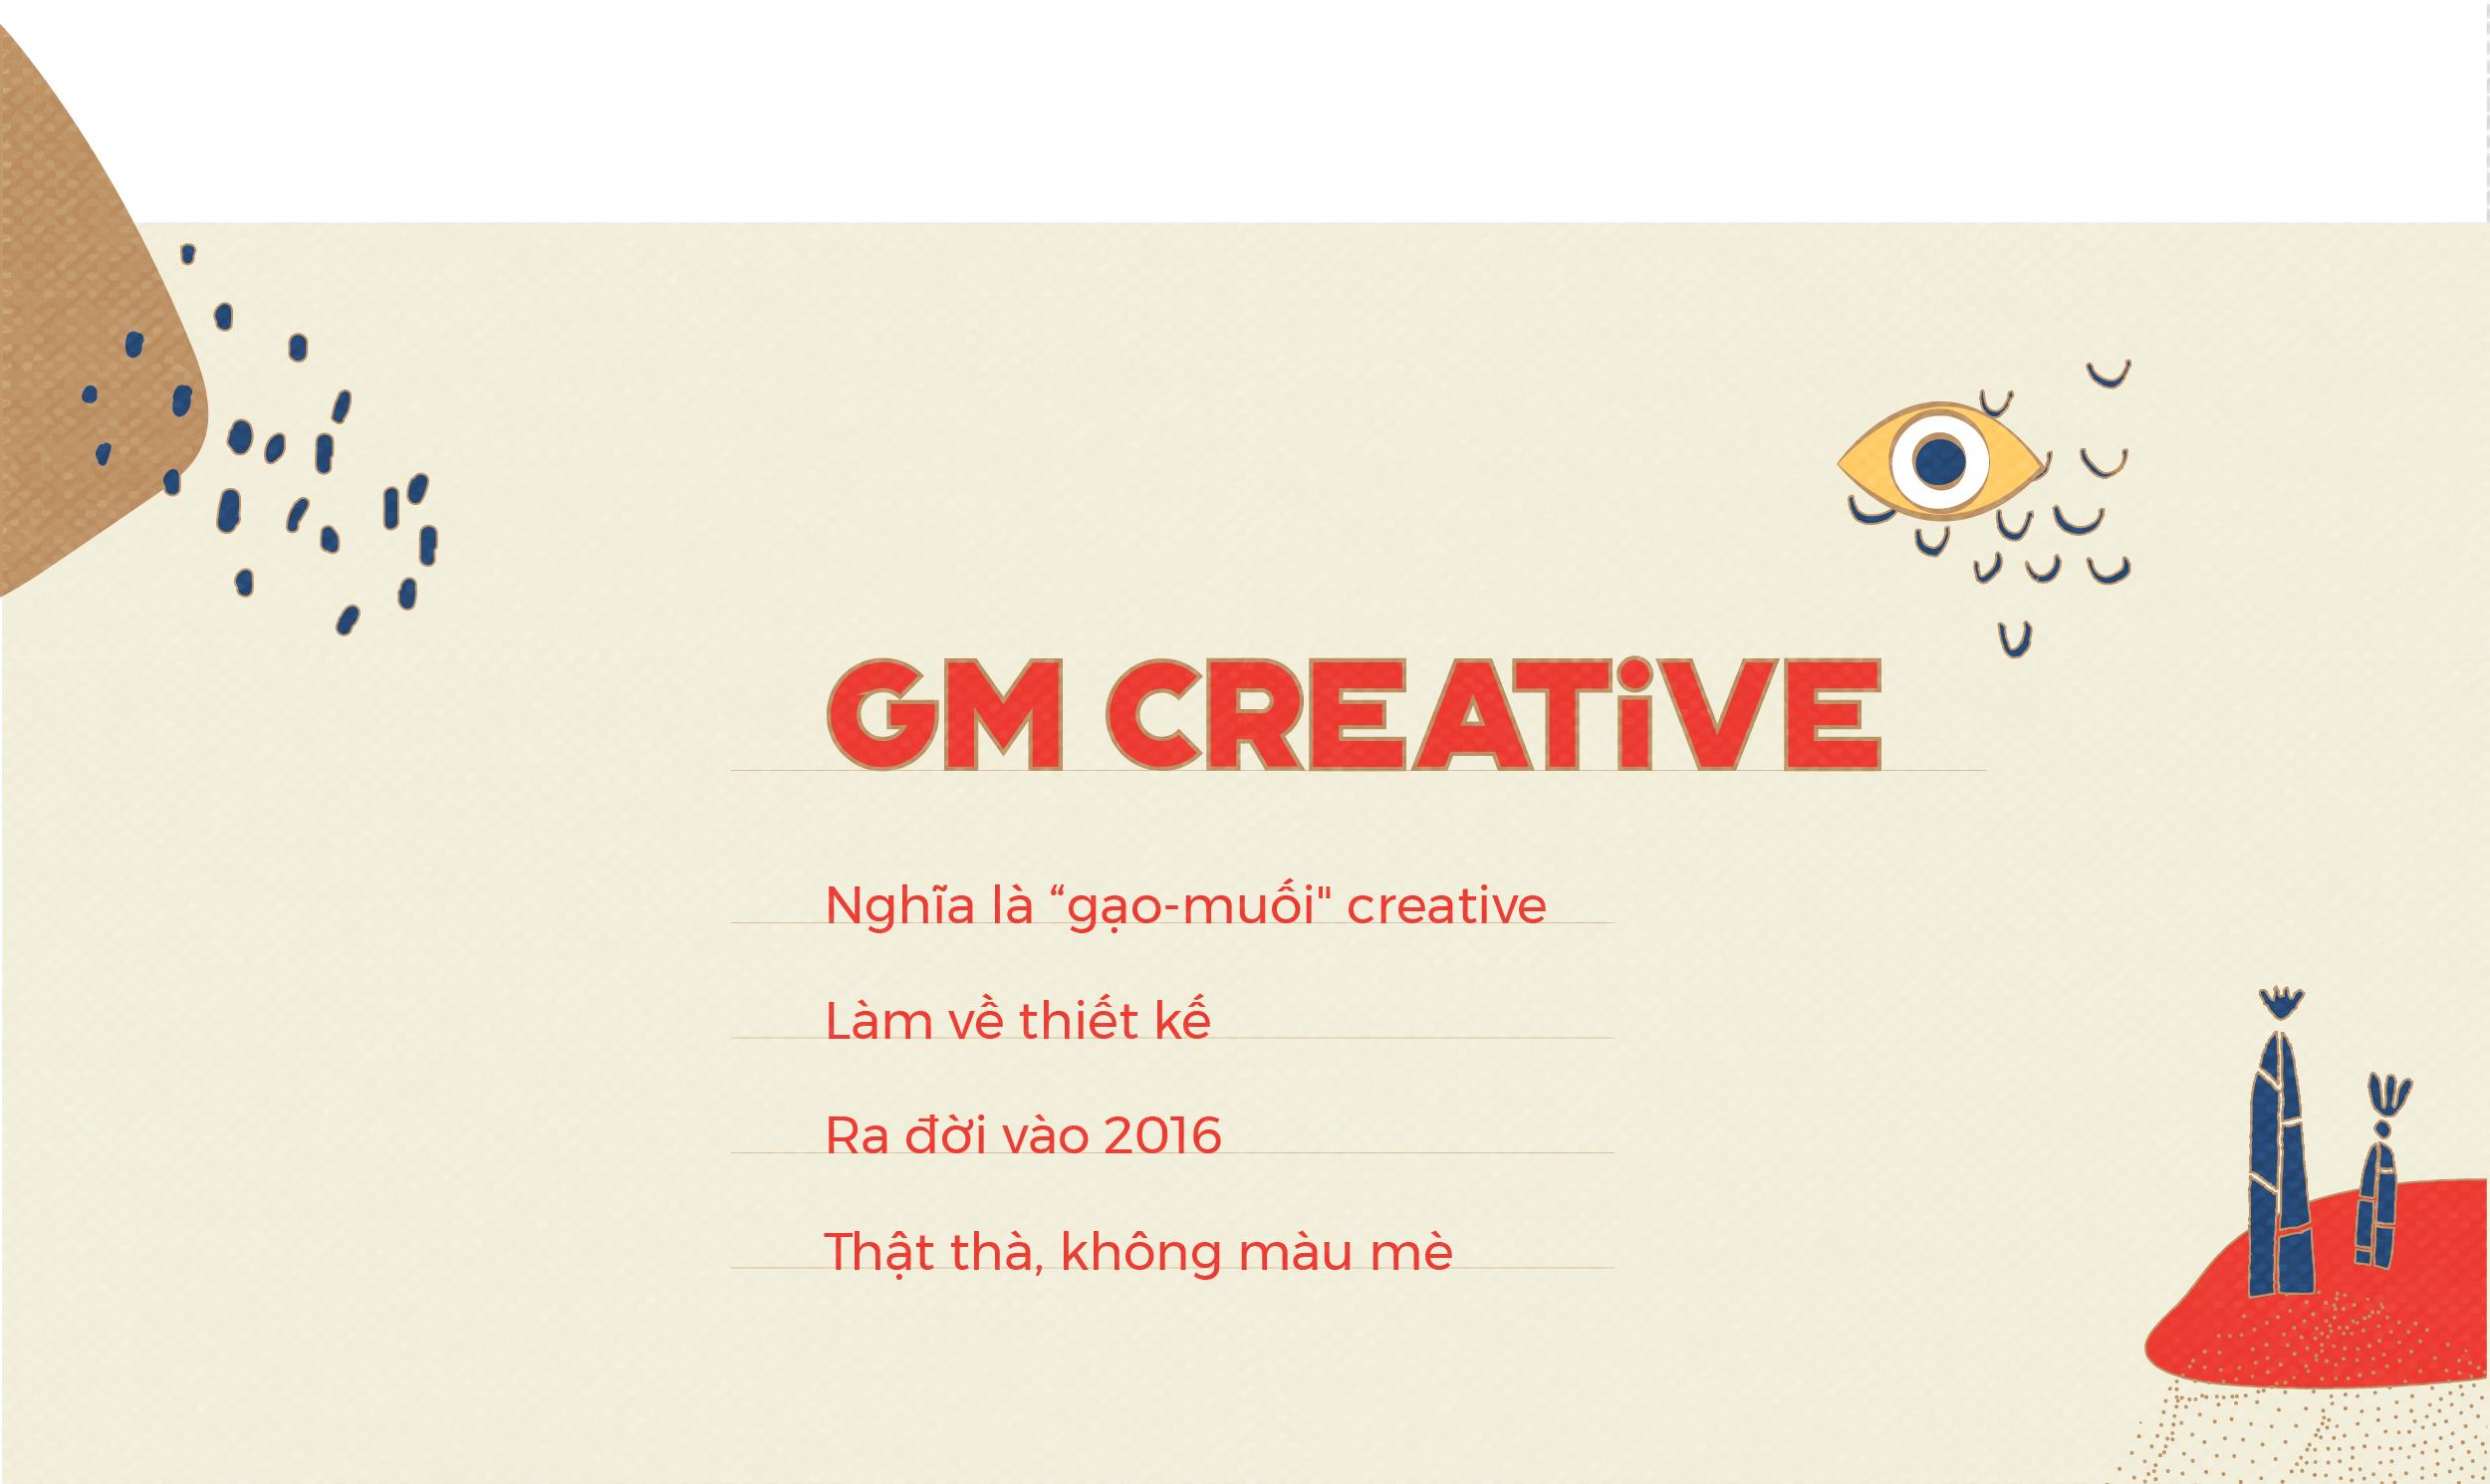 20180713 idesign gmcreative 2 info 1